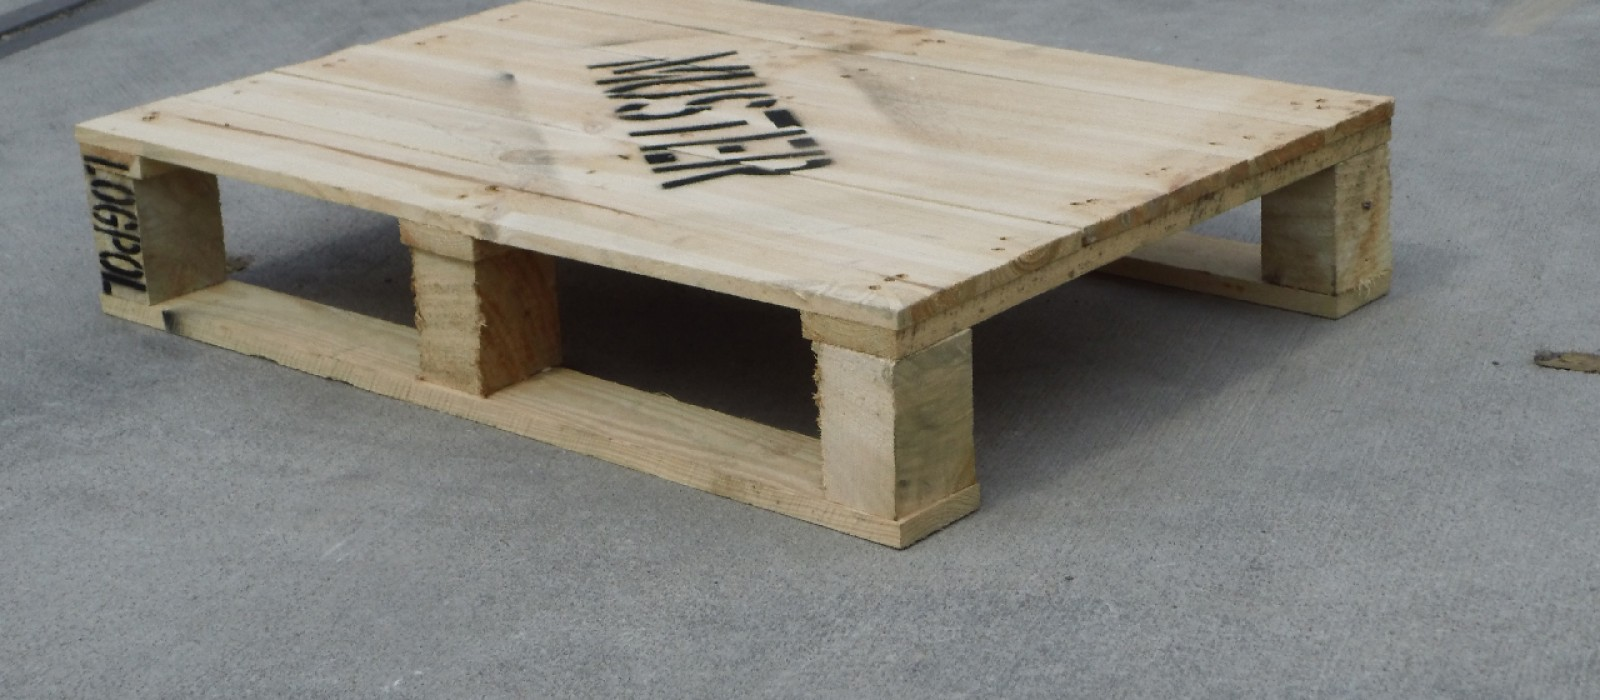 Holzpalette-470×670-als-4–Wege-Ausführung